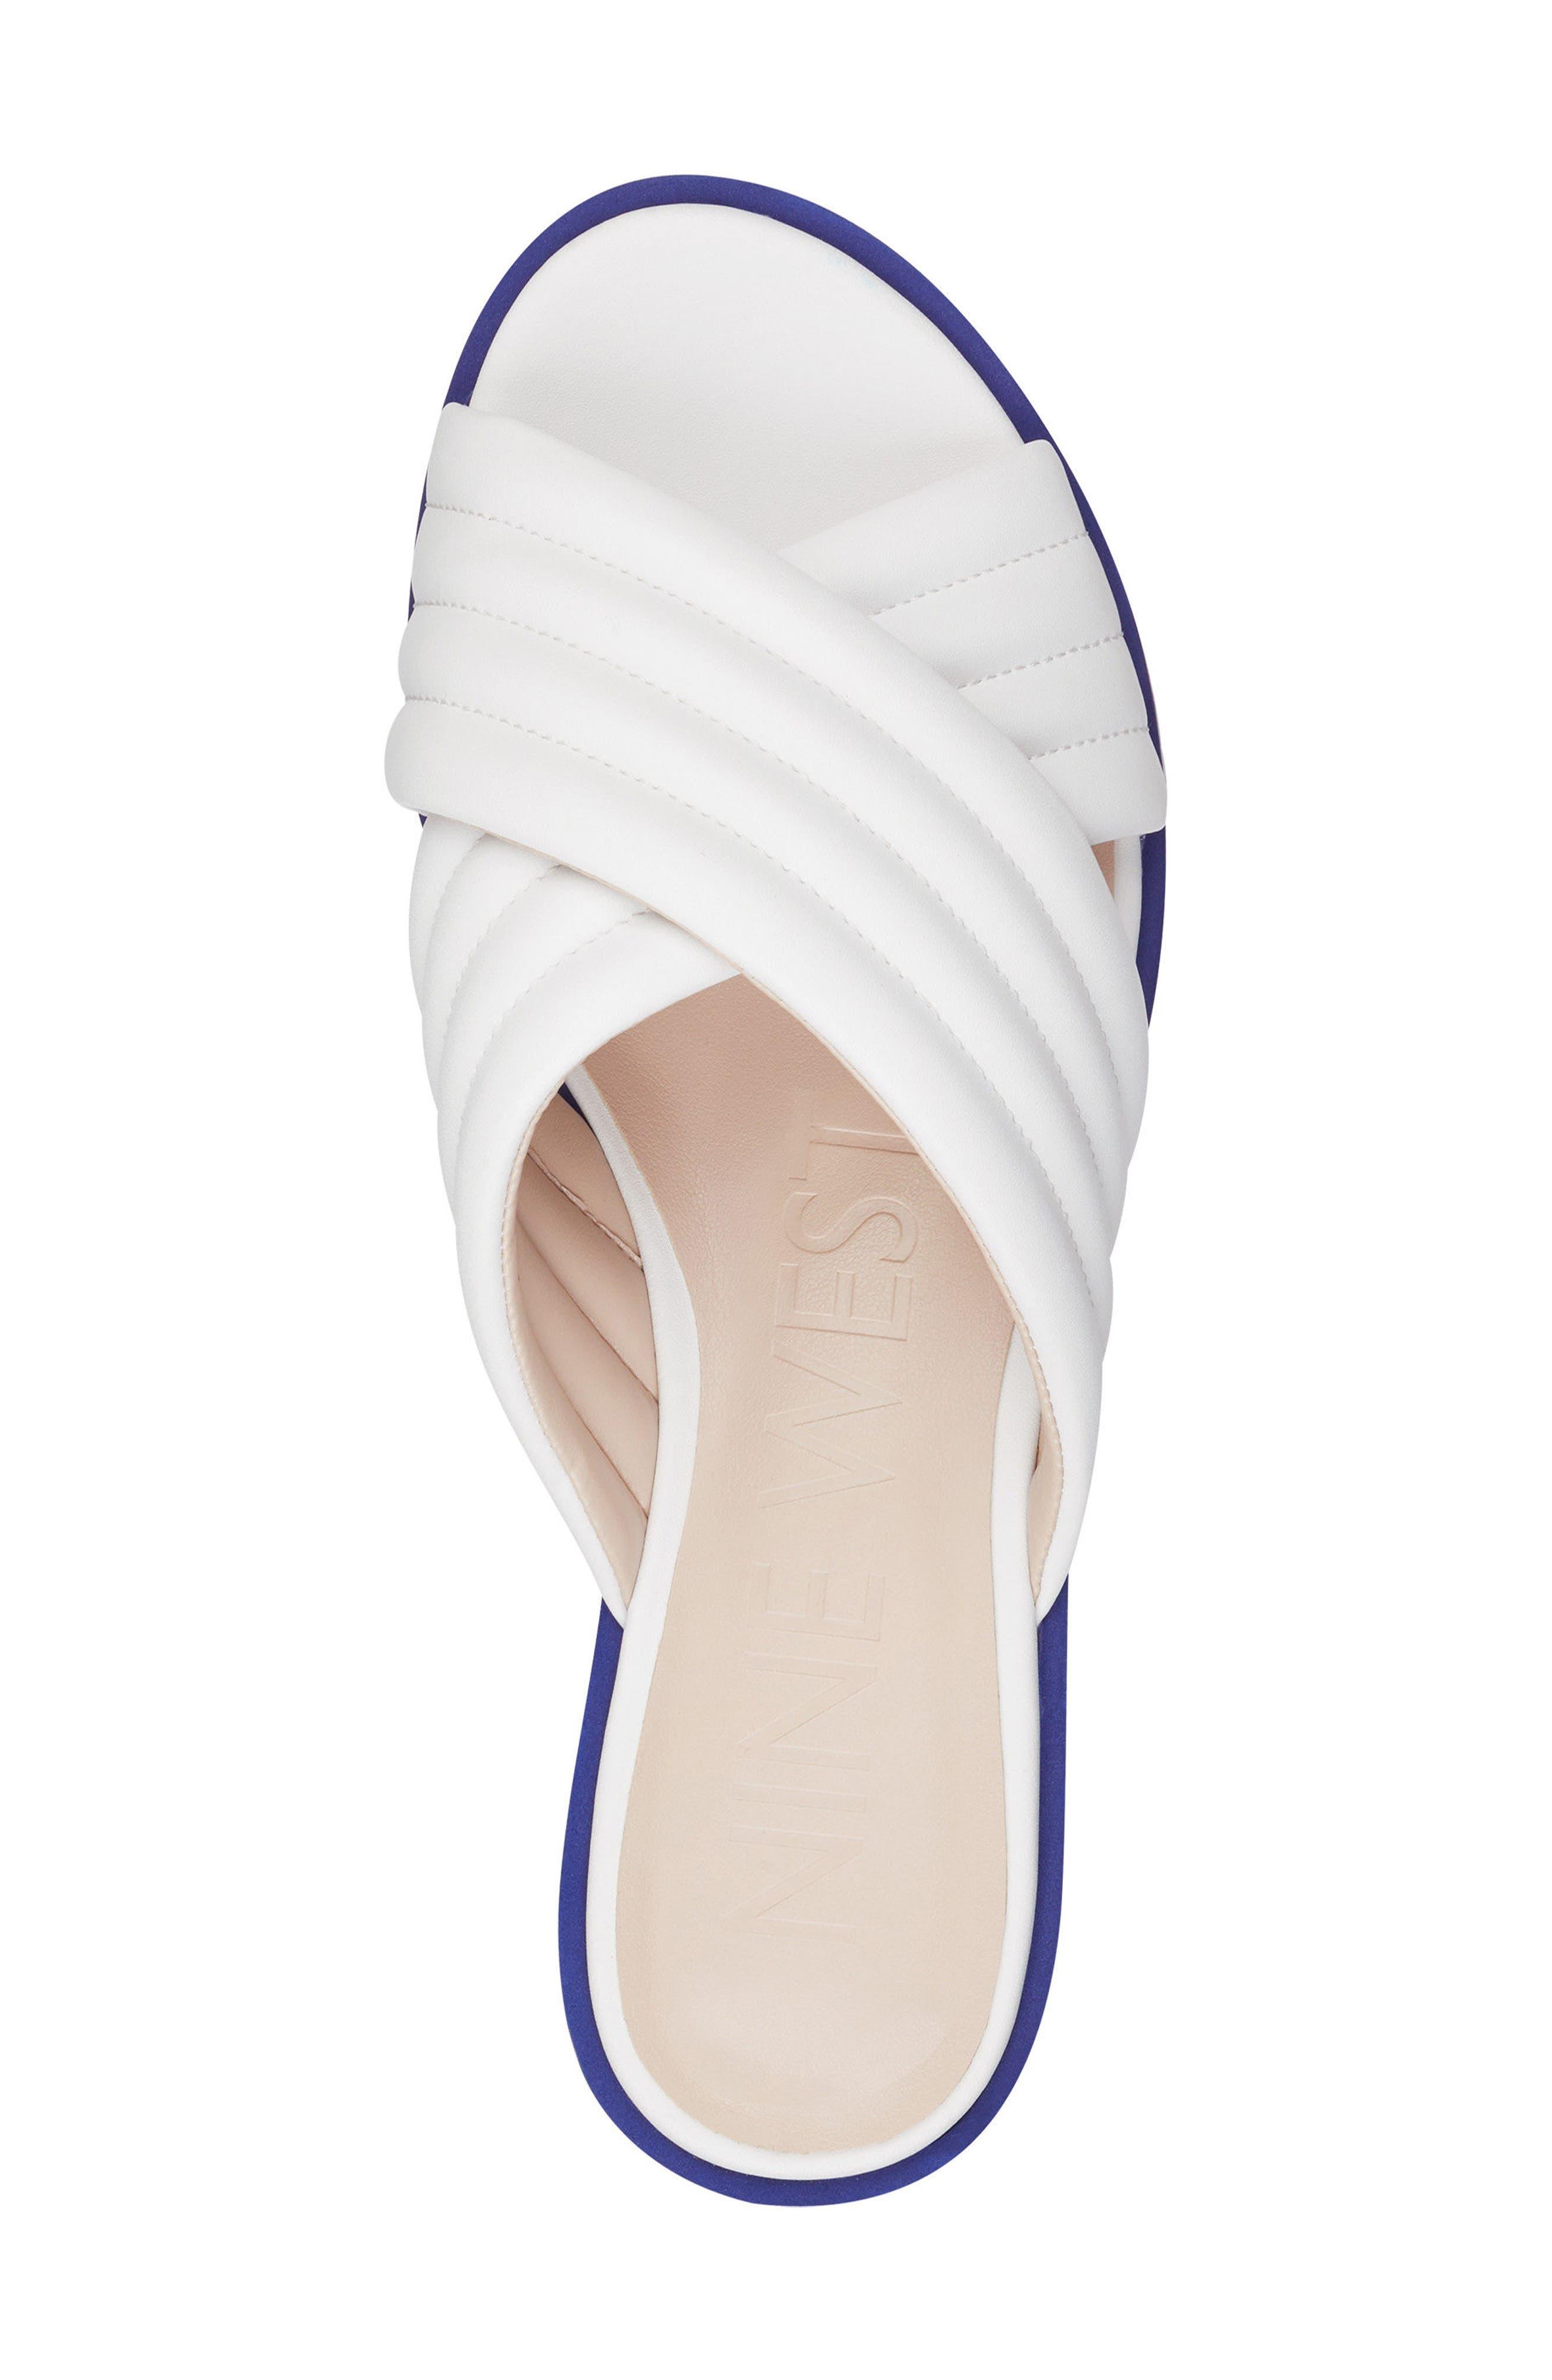 Zonita Platform Slide Sandal,                             Alternate thumbnail 15, color,